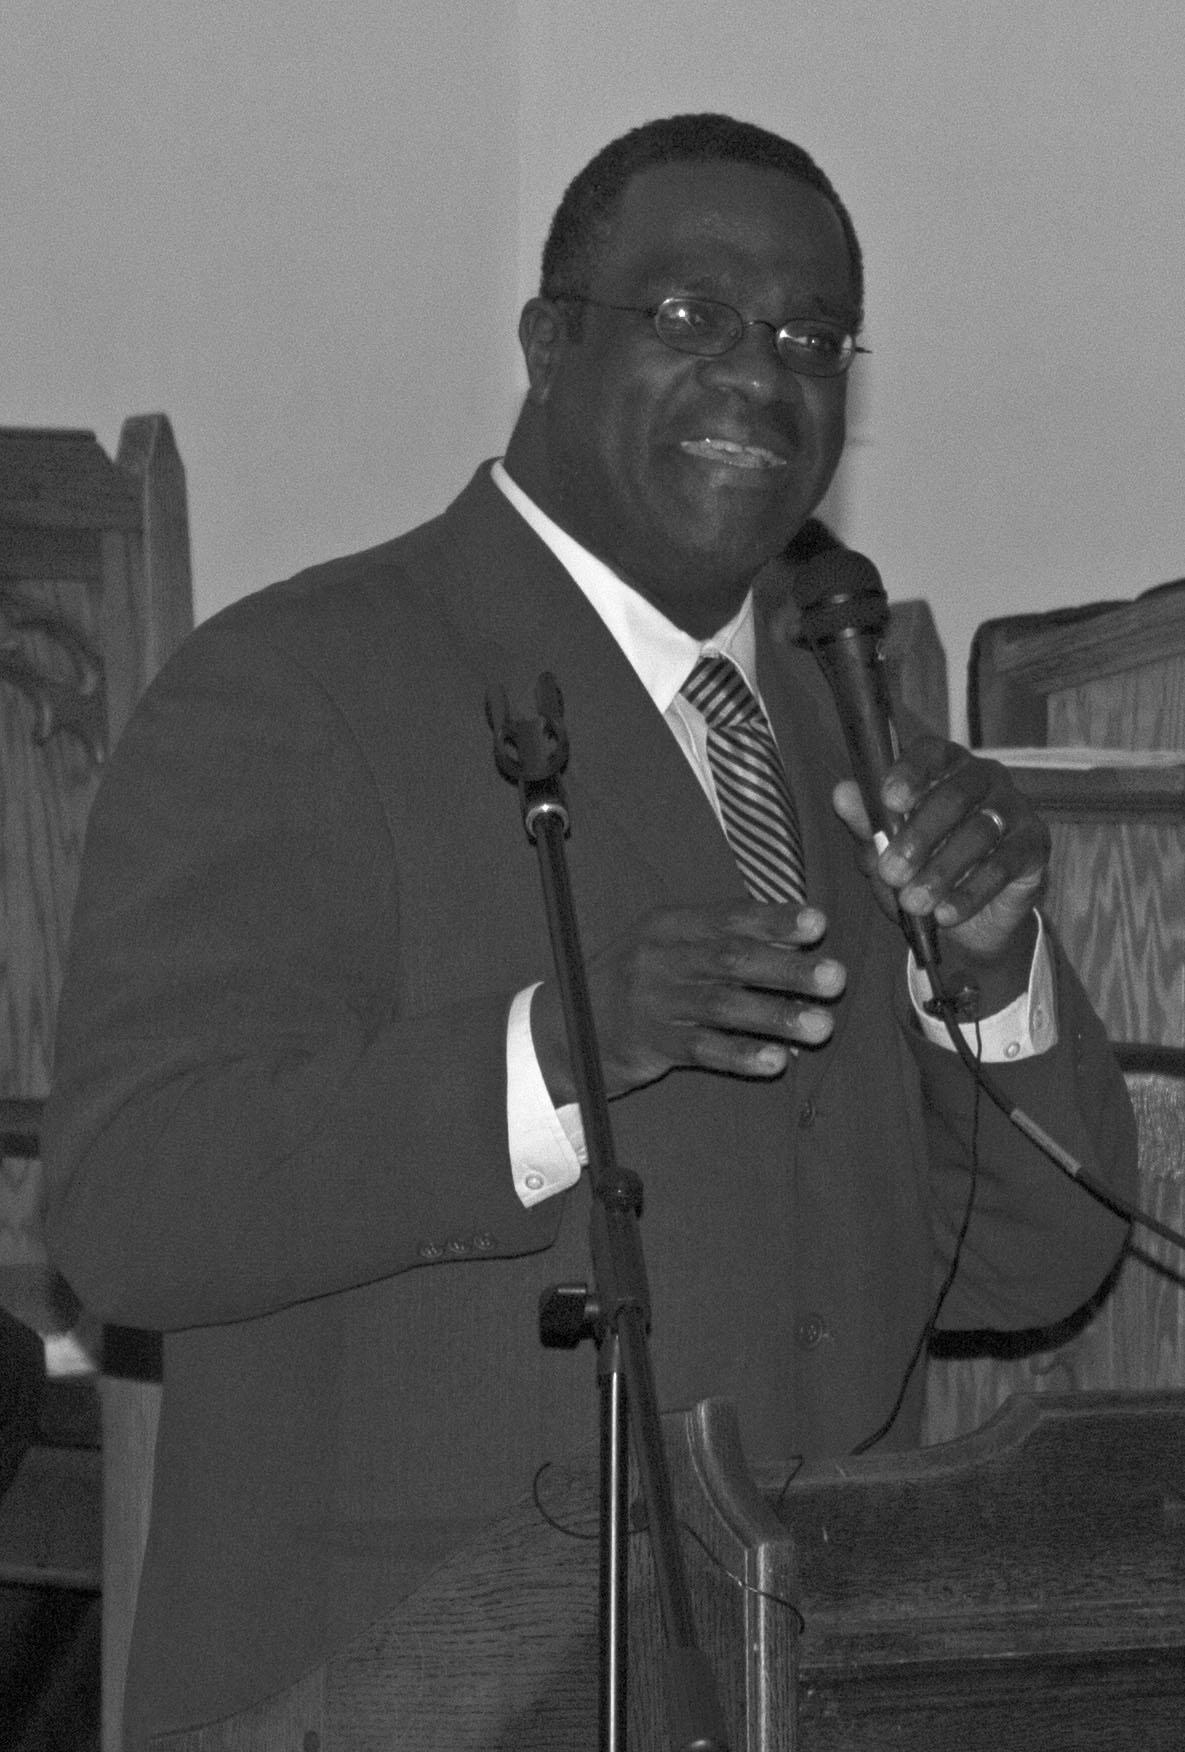 Democrat Jamael Tito Brown elected next Youngstown mayor